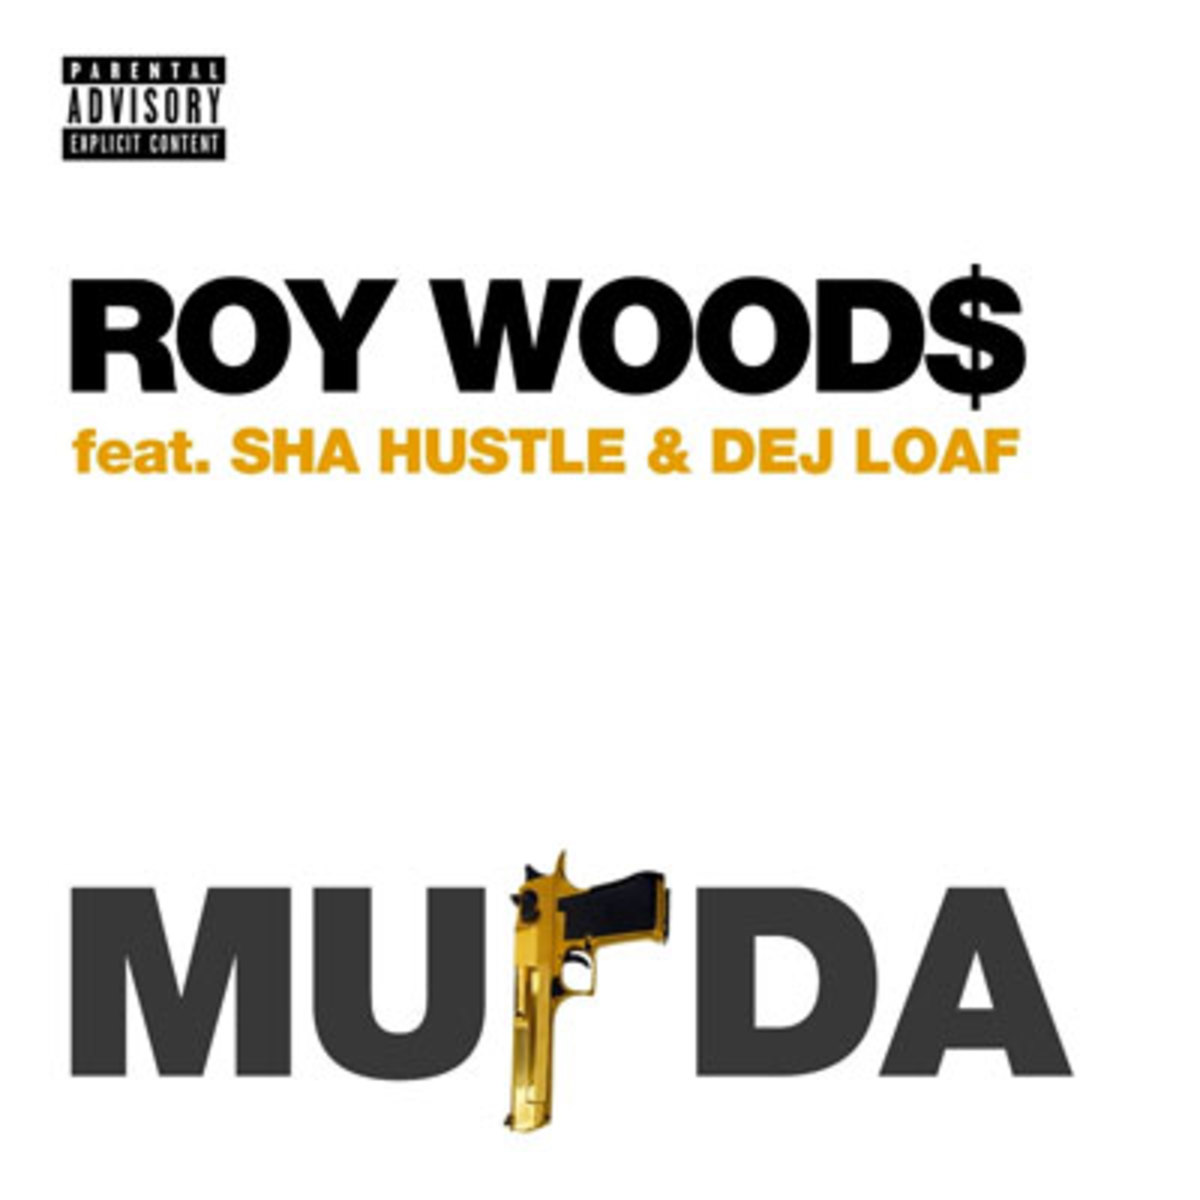 roywoods-murda.jpg